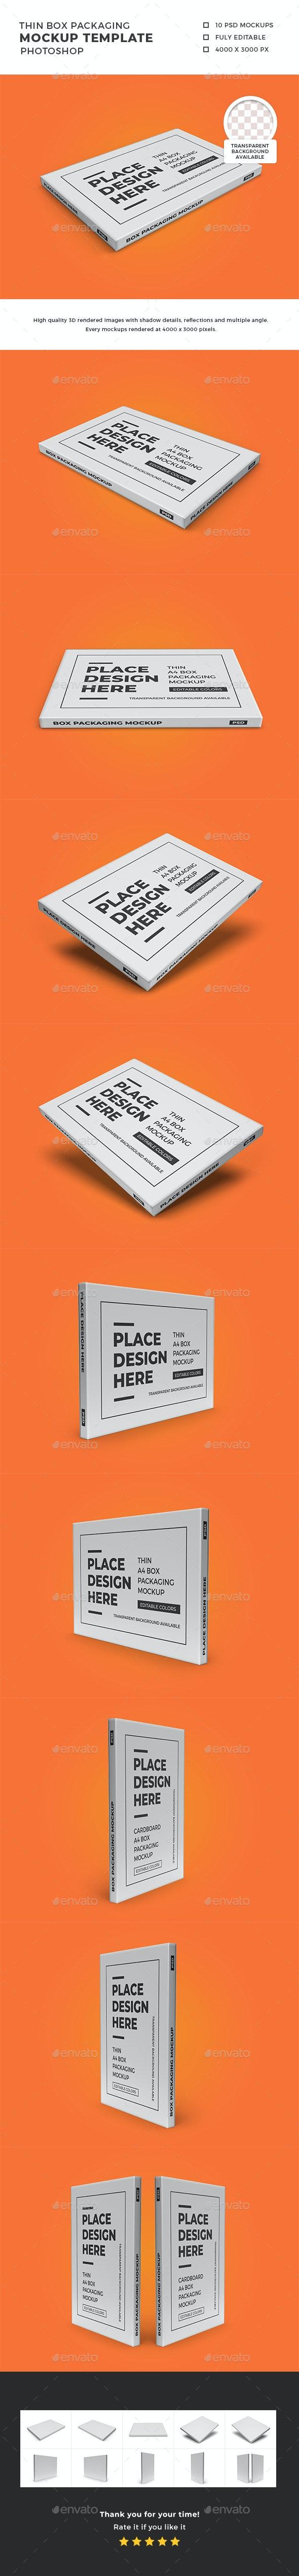 Thin Box Packaging Mockup Template Set - Packaging Product Mock-Ups